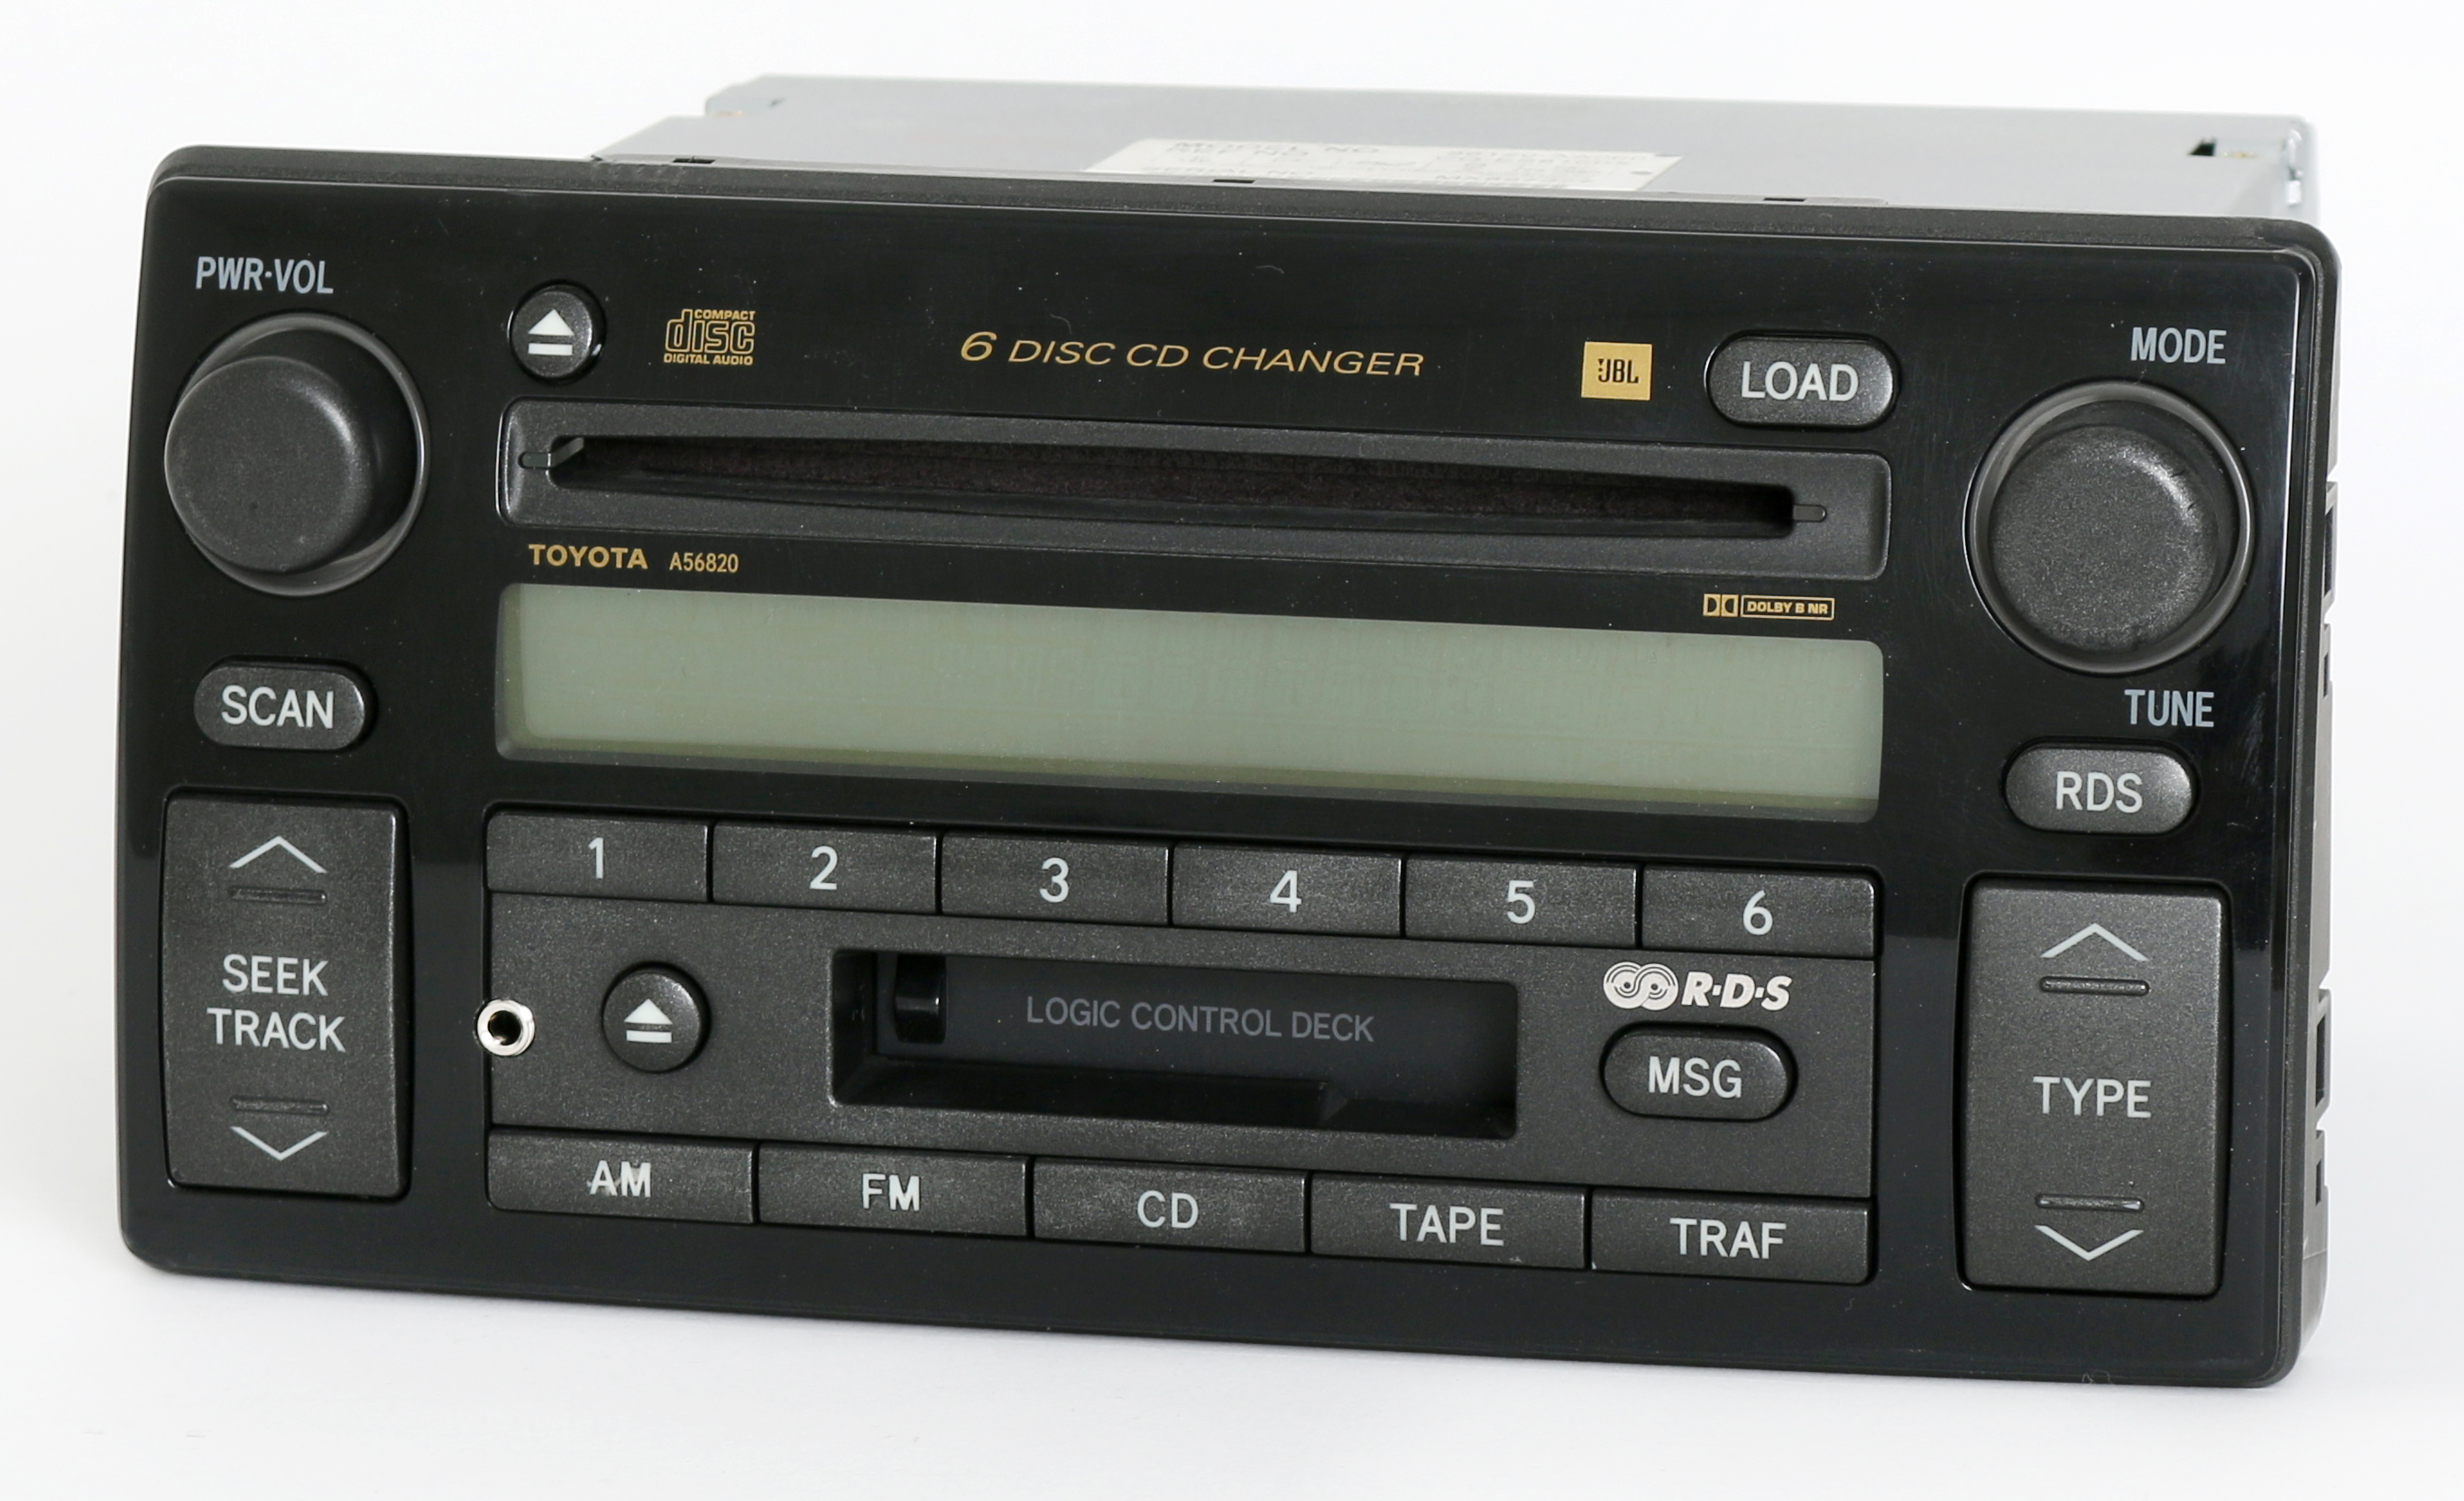 toyota camry xle 2002 04 jbl radio am fm 6 disc cd cs w aux input 86120 aa060 ebay. Black Bedroom Furniture Sets. Home Design Ideas